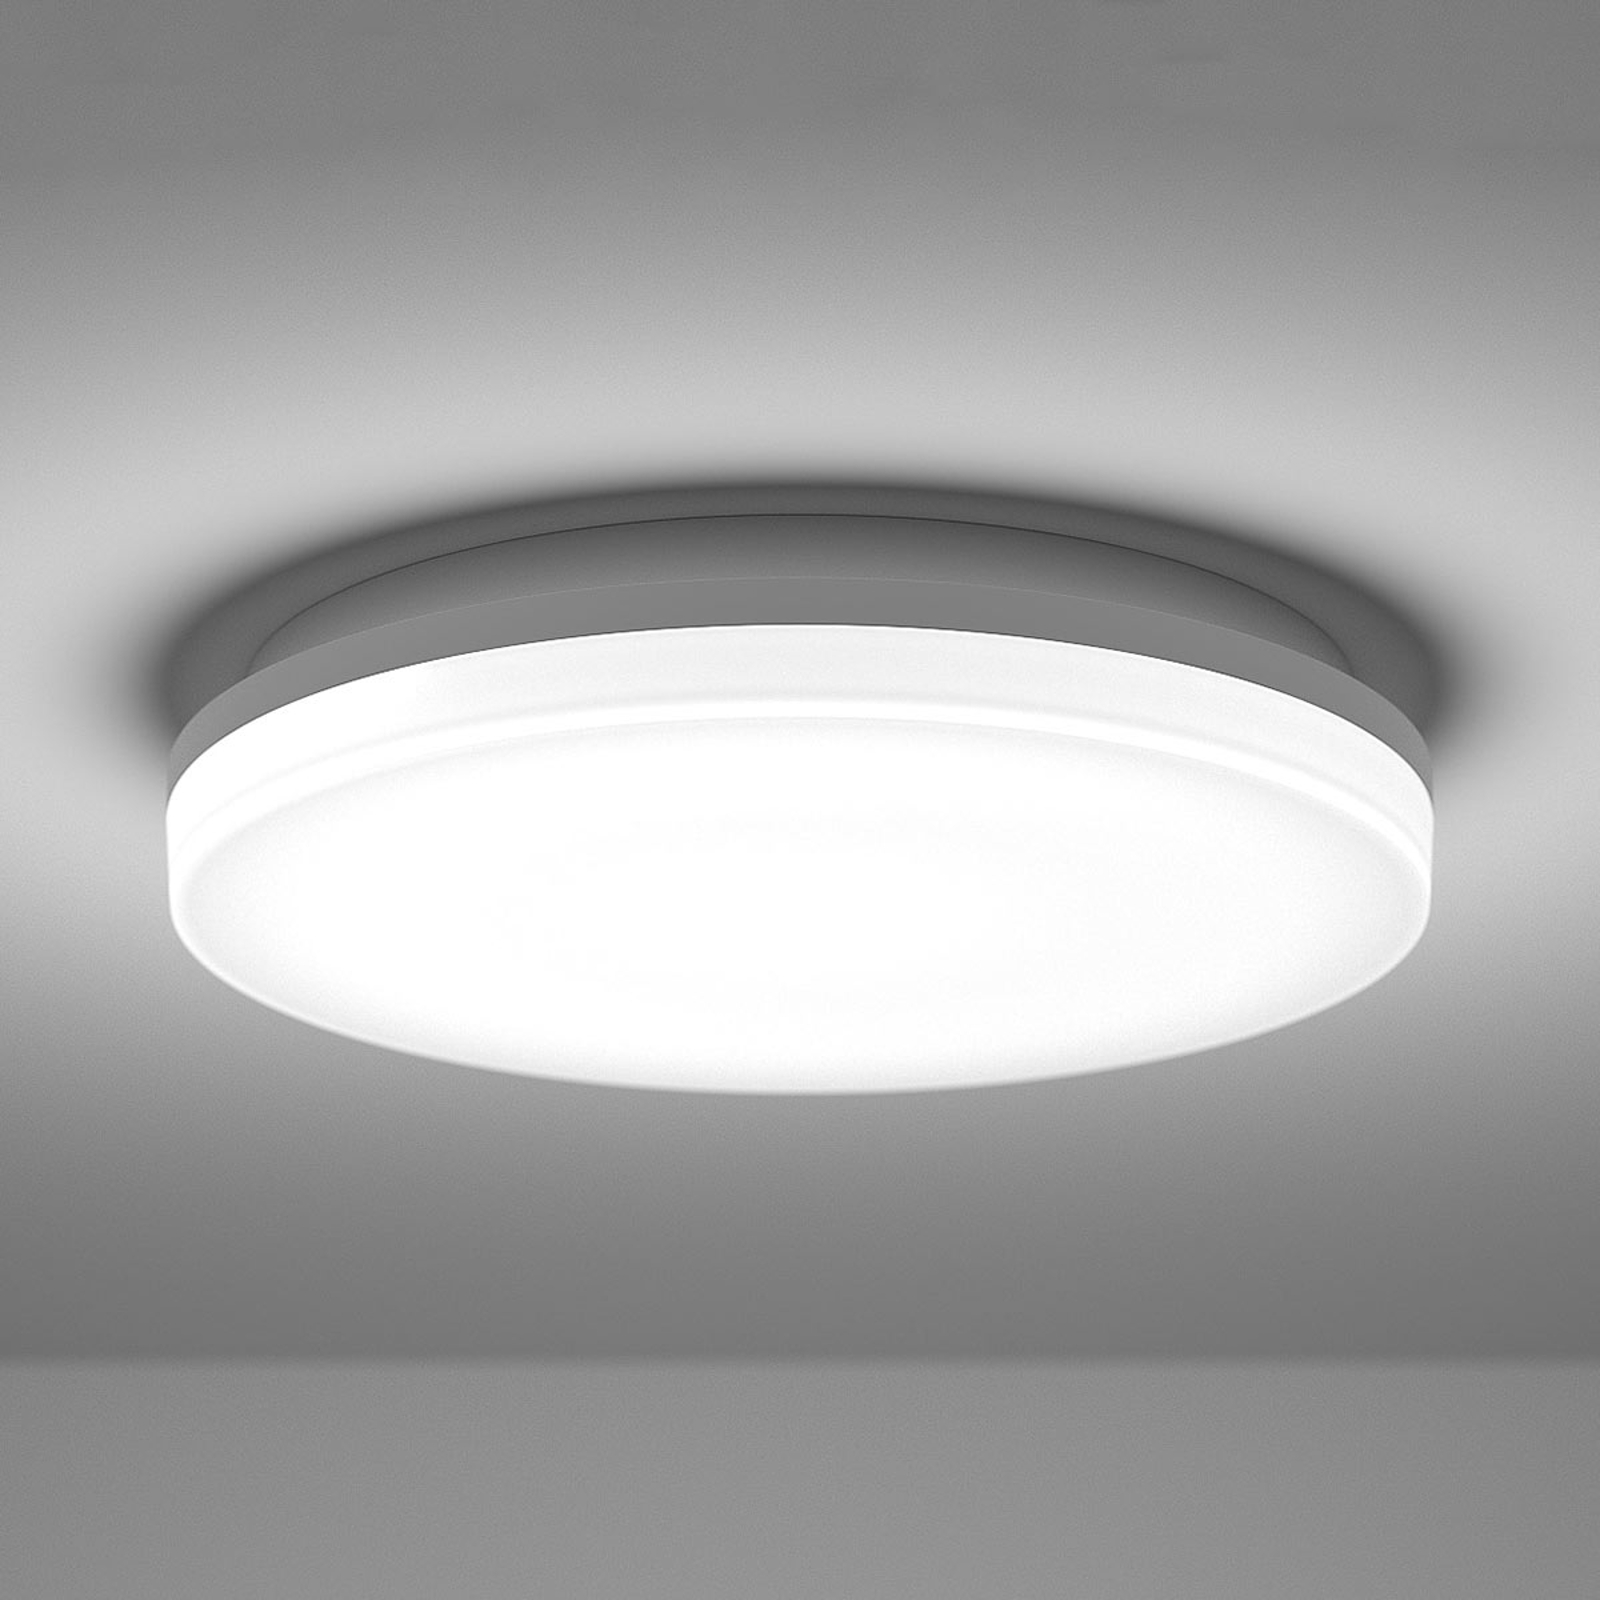 Regent Isigo lampa sufitowa LED DALI 25W Ø30cm